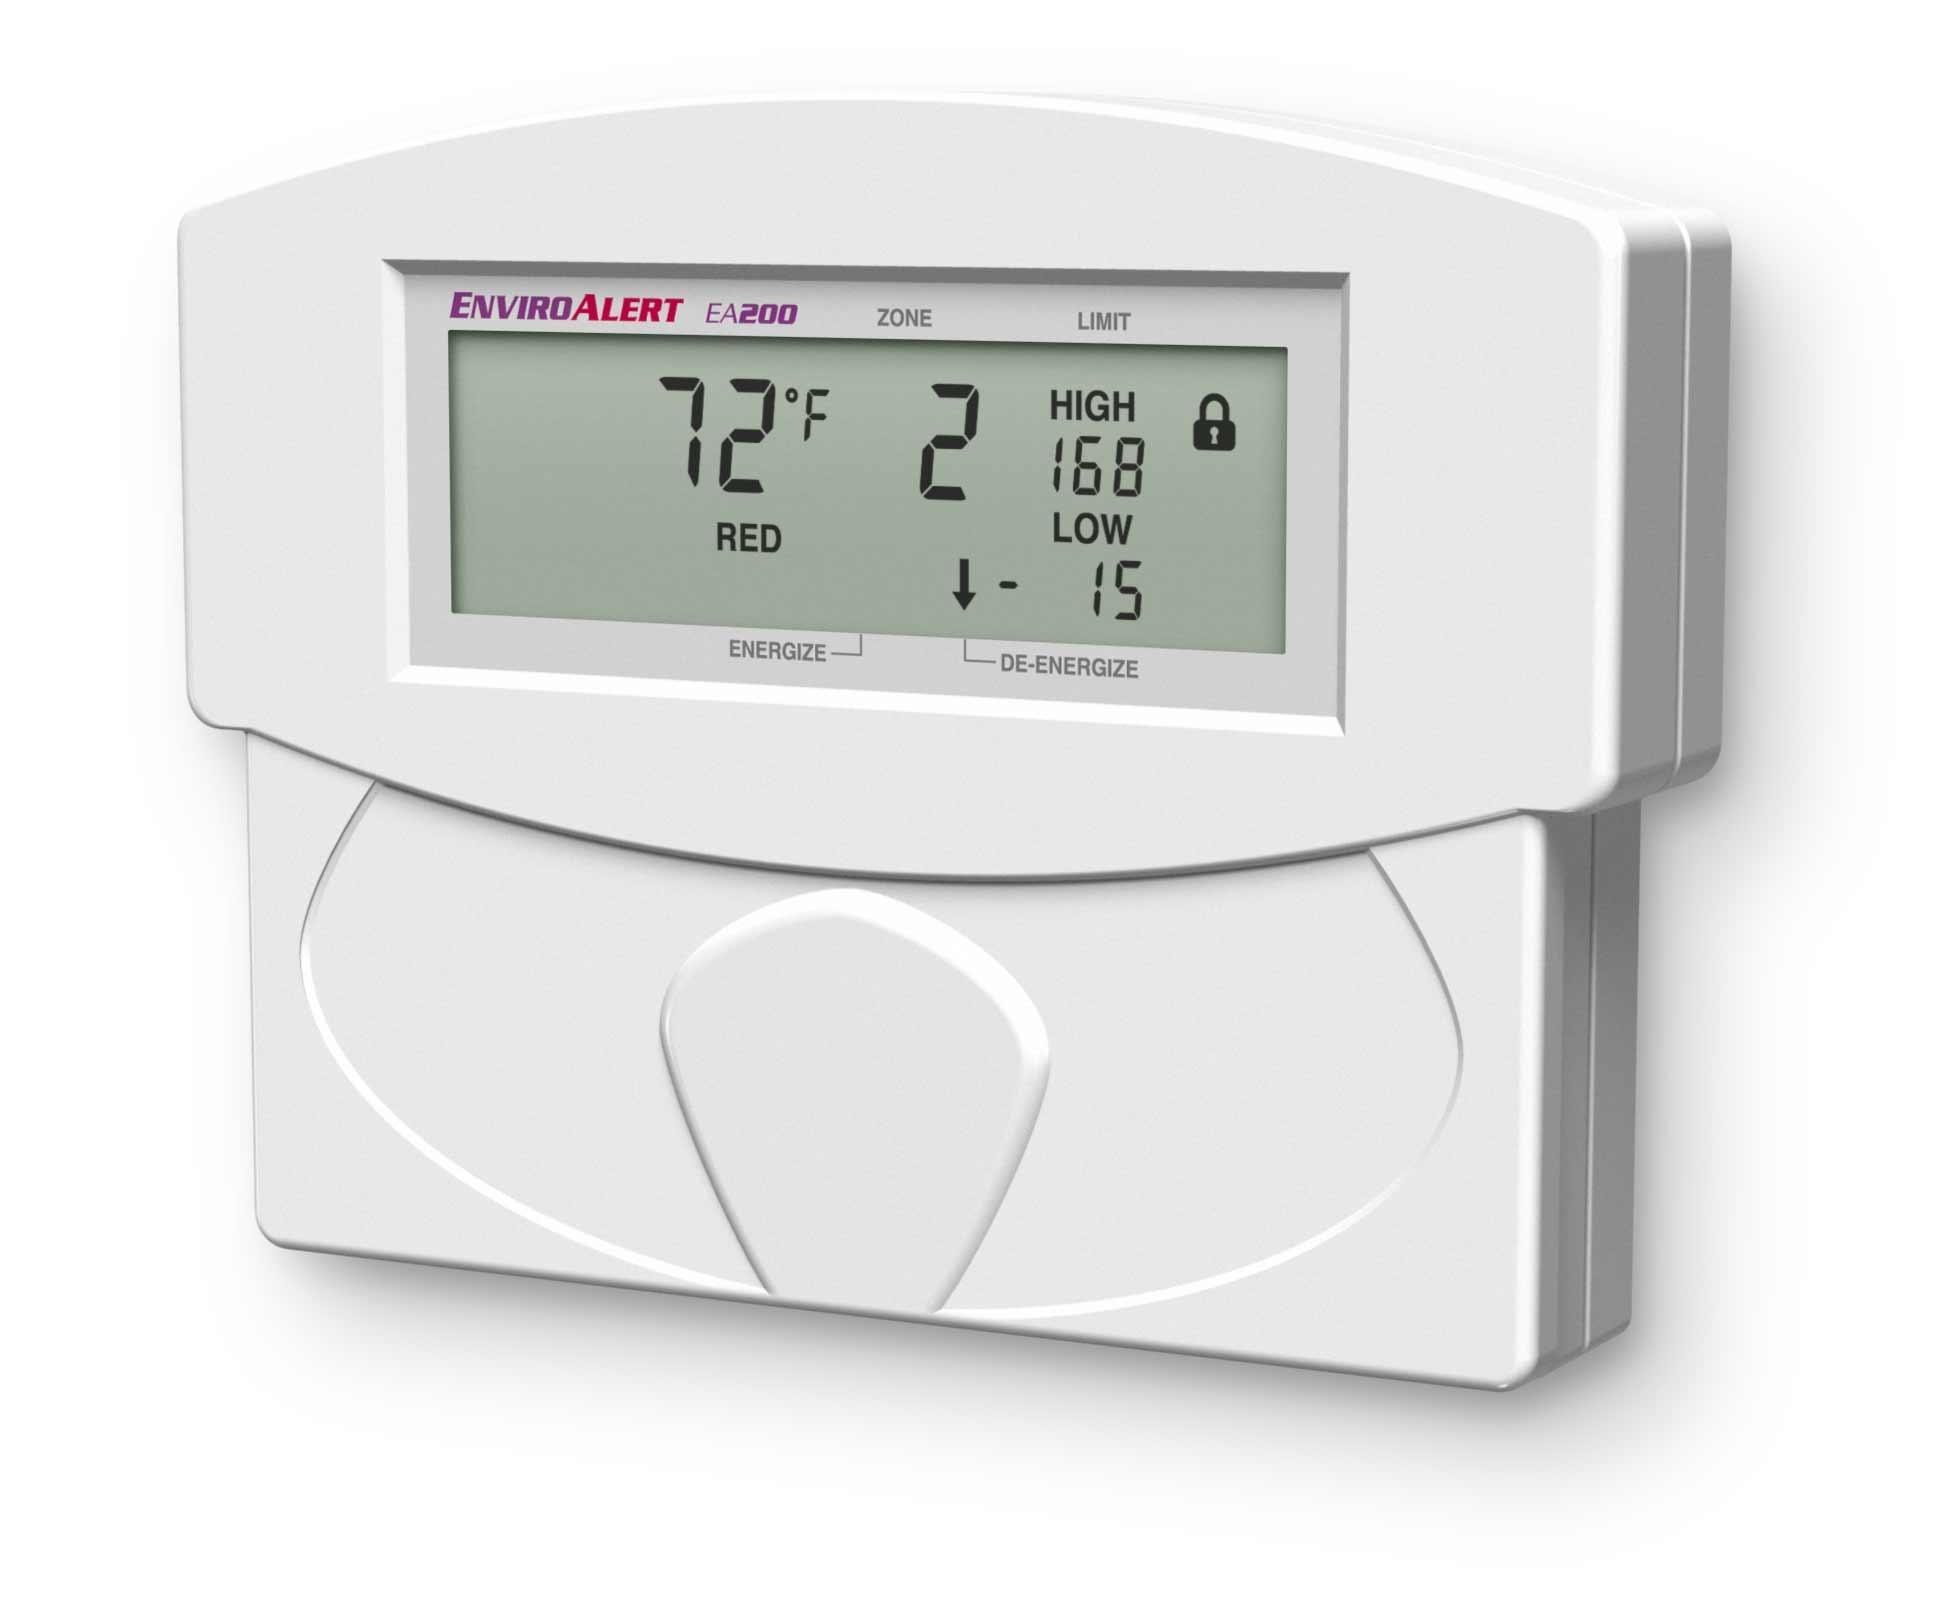 Brainerd Enviro Alert Home Security Wireless Alarm System